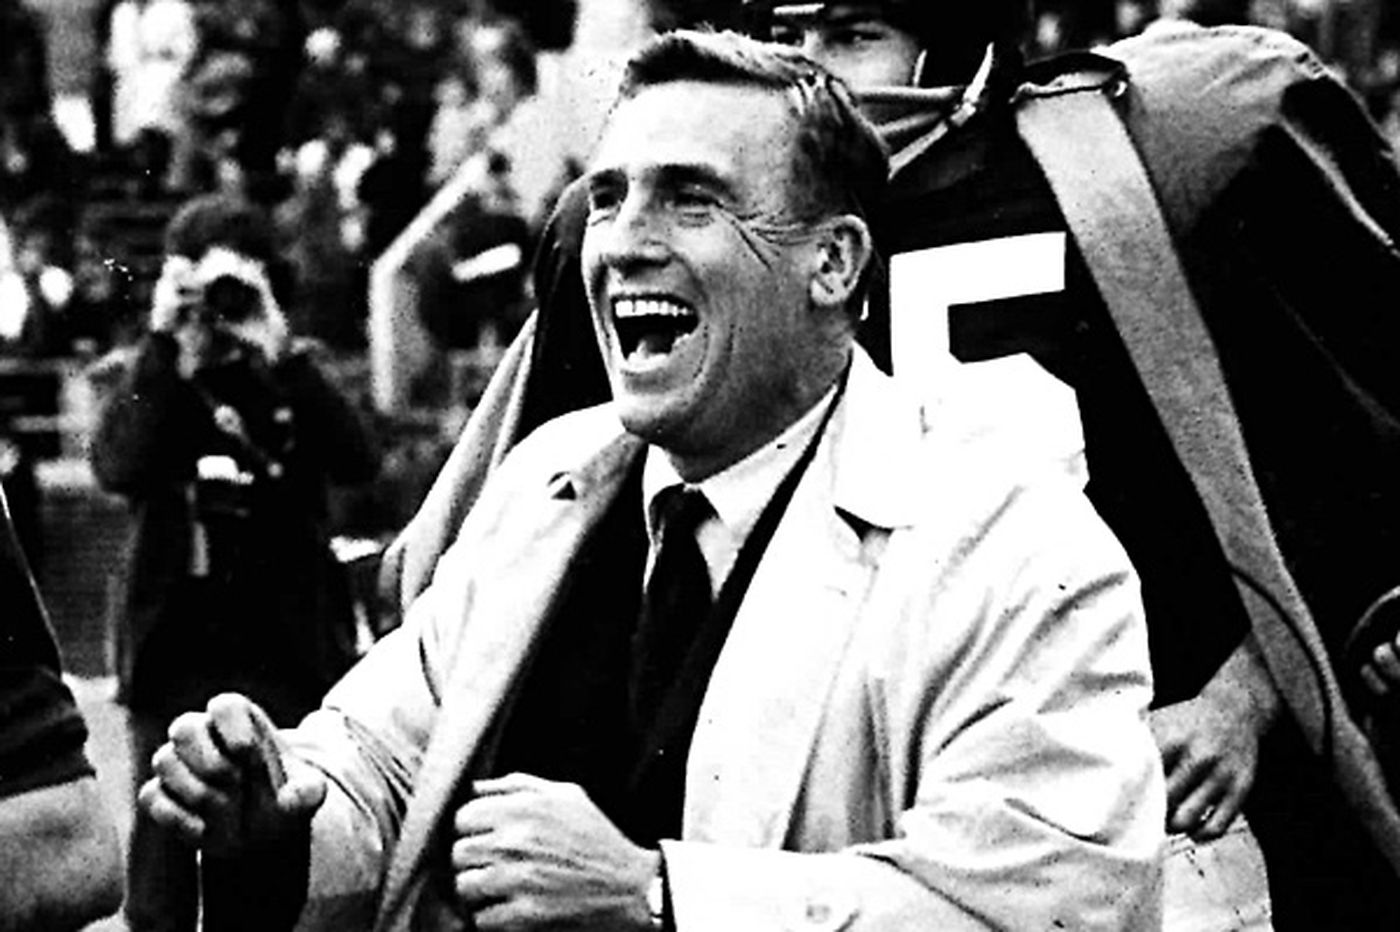 Bob Odell, 90; college football hall of famer starred at Penn